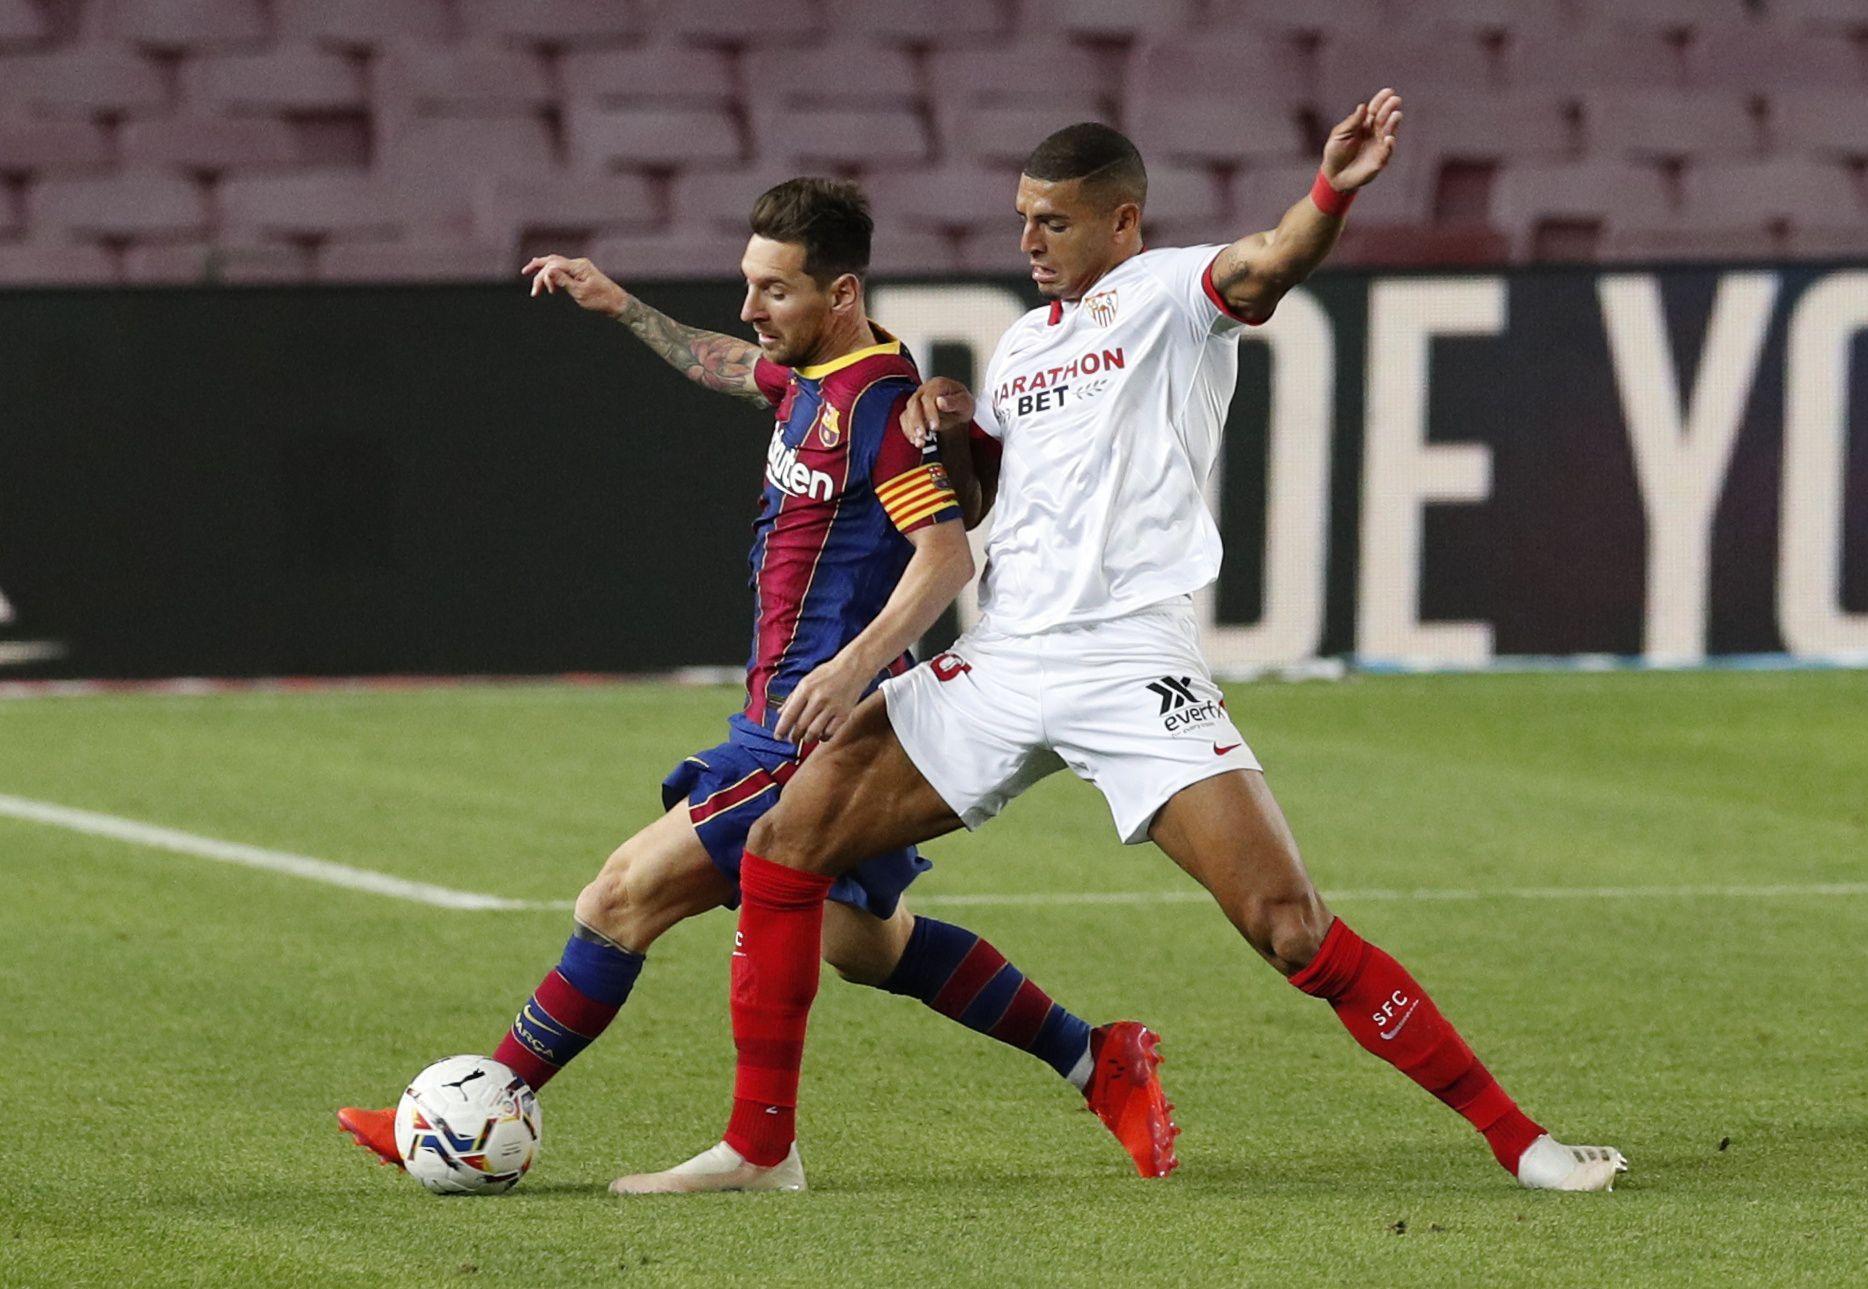 Barcelona vs. Sevilla, capítulo I: empiezan a definir al finalista de la Copa del Rey (Foto: Reuters)